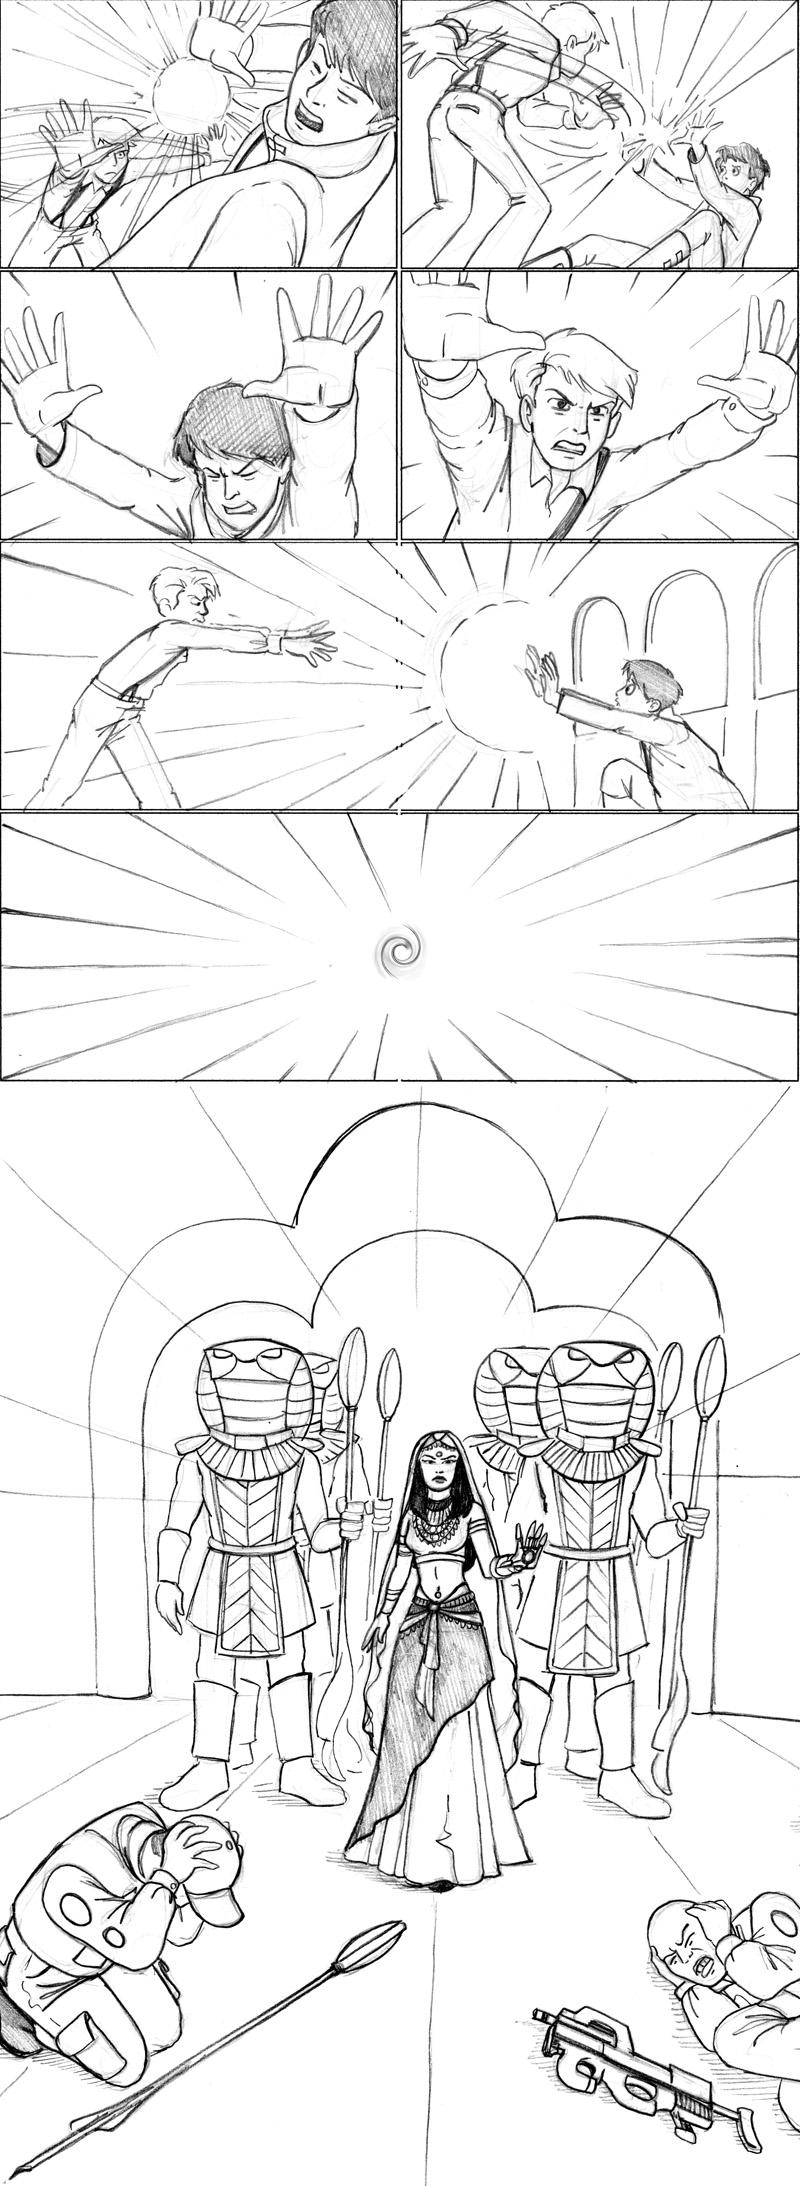 049 The Genosha Sequence